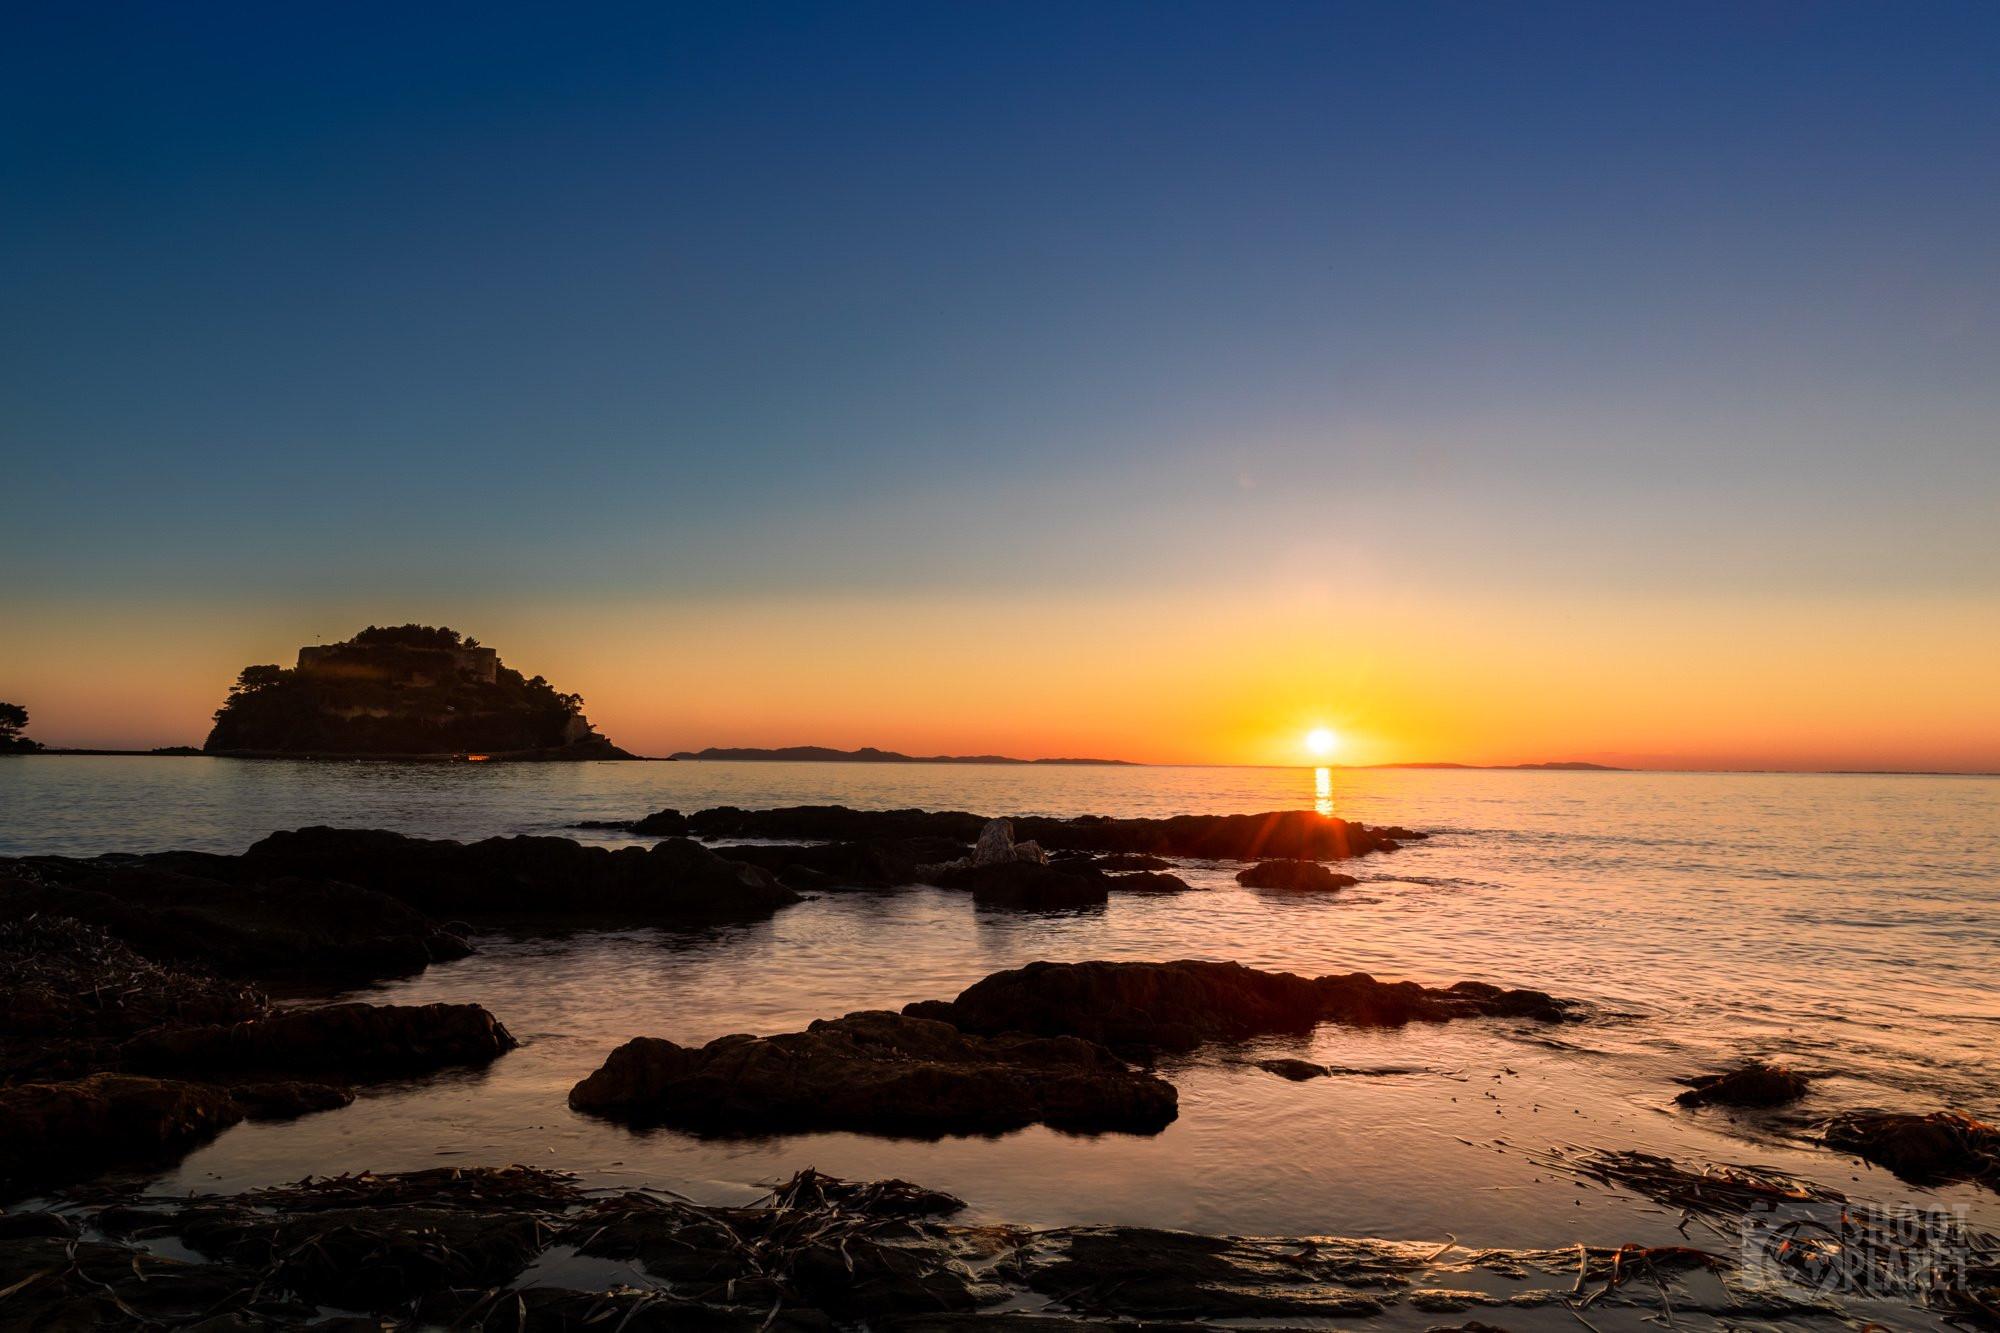 Bregançon fort and rocks sunset, France